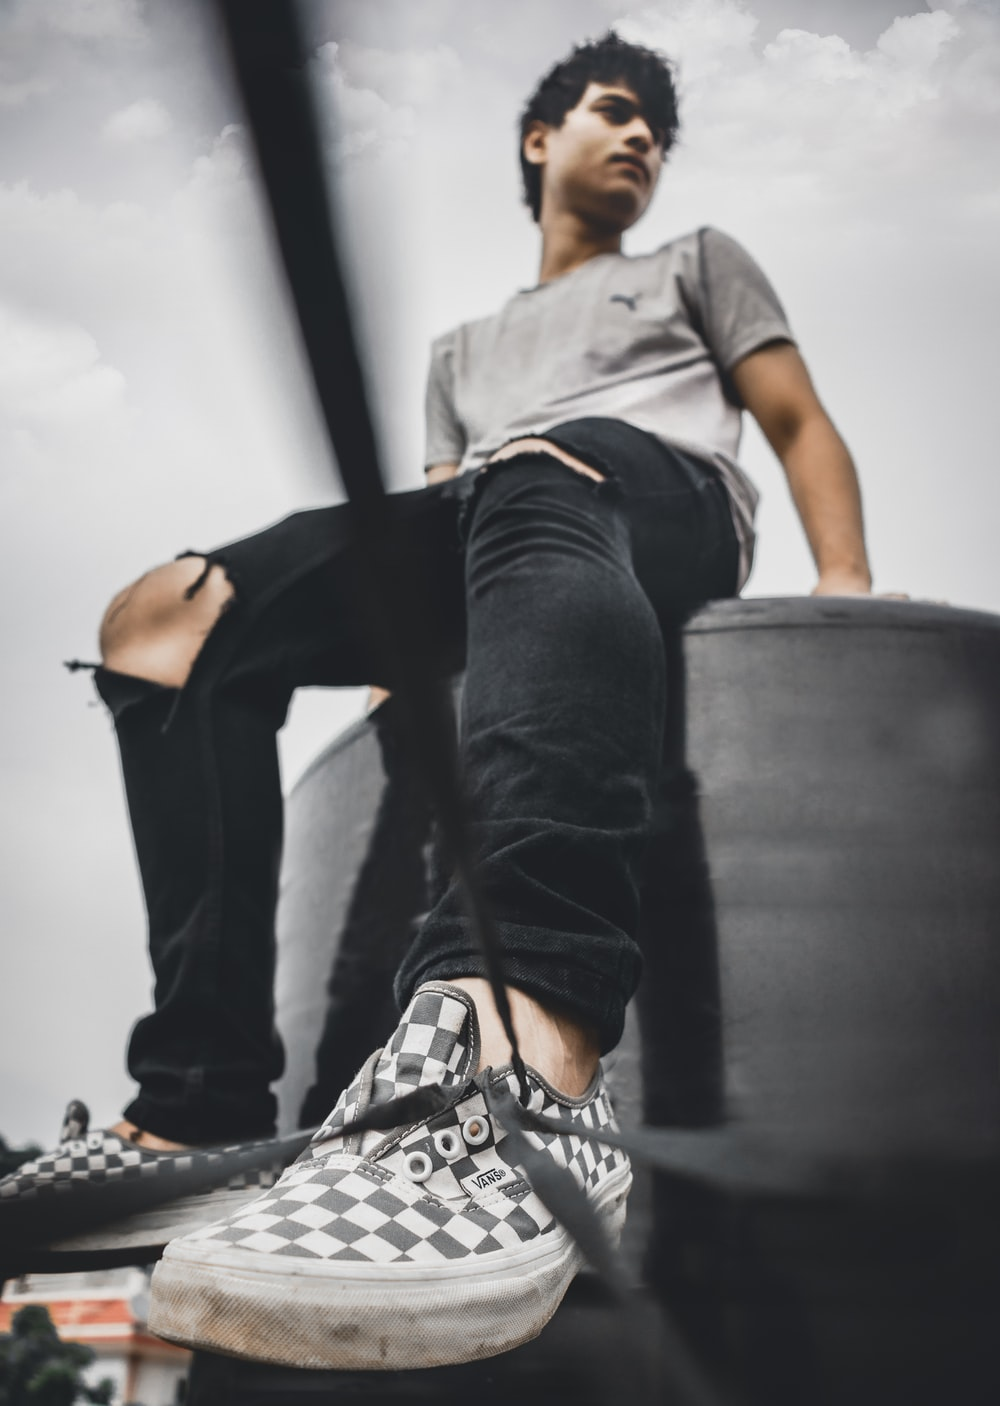 man wearing distressed black denim jeans close-up photography